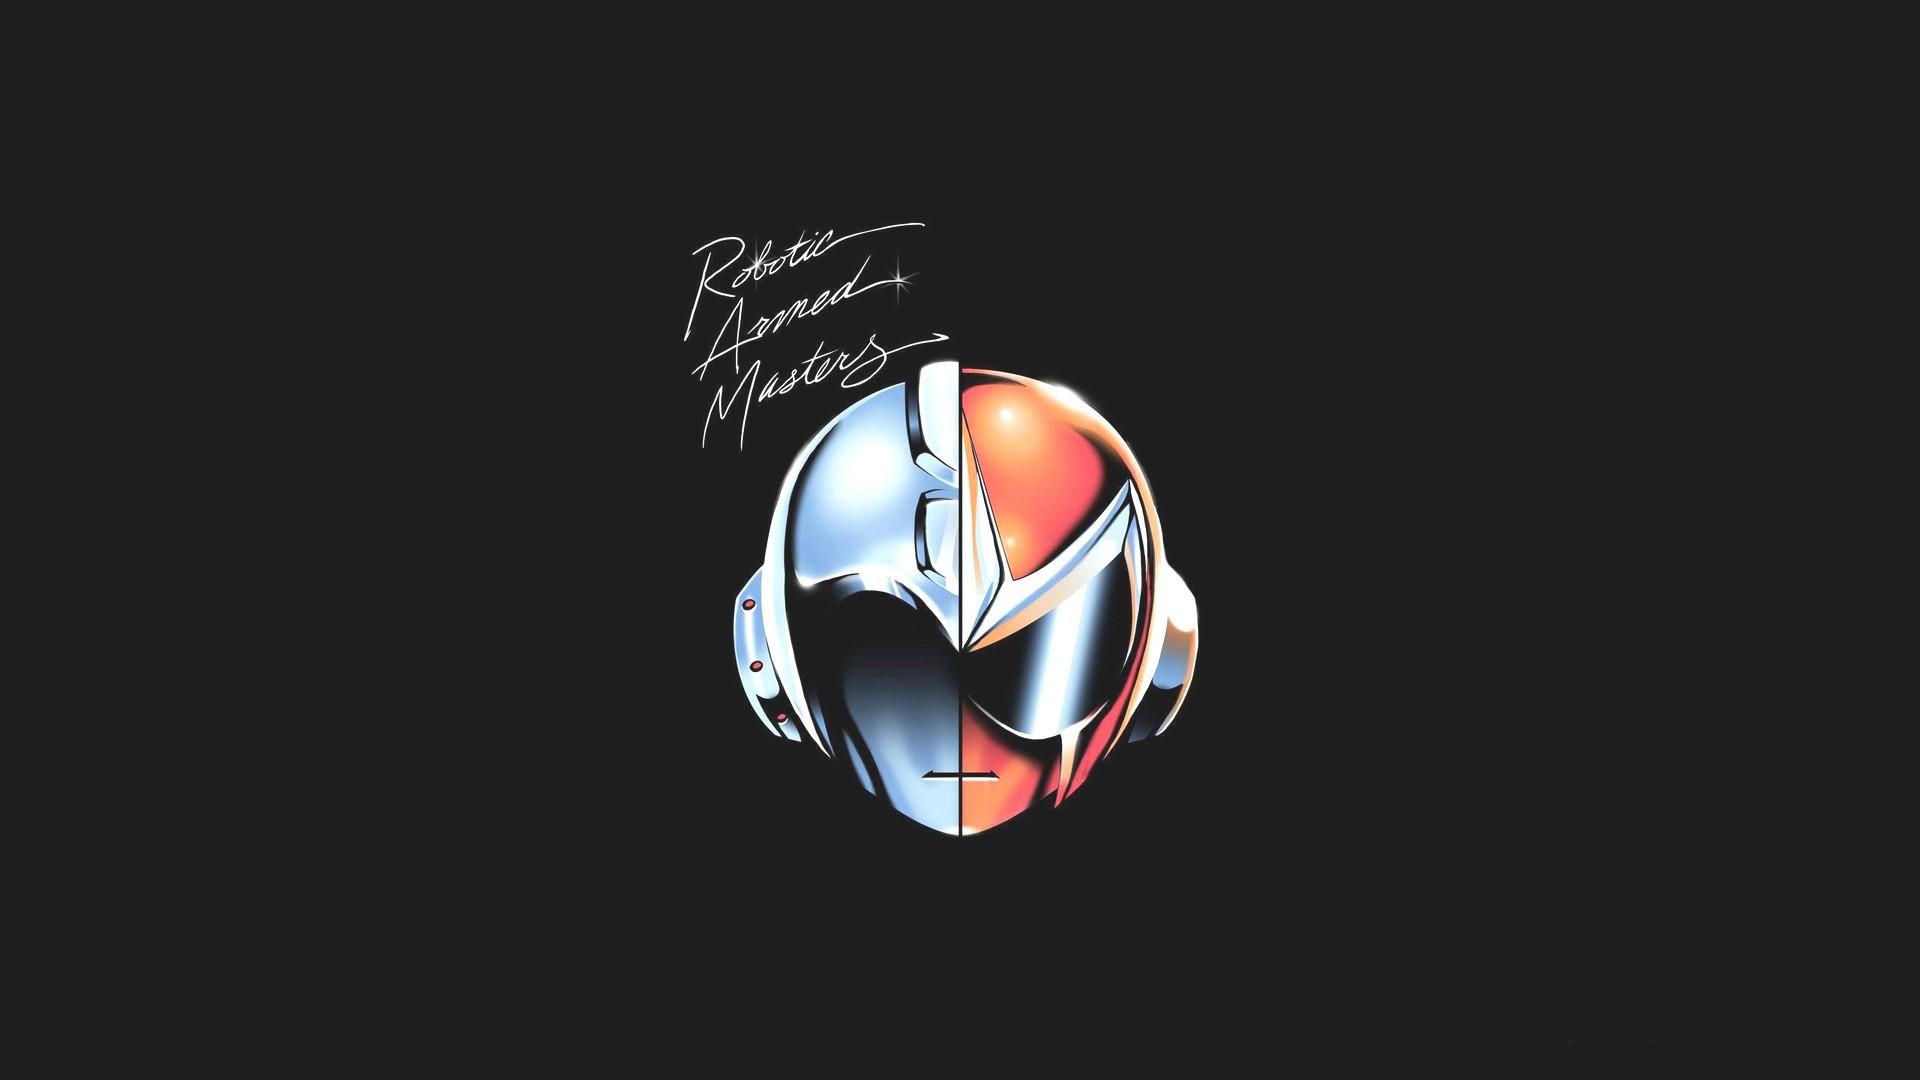 #Daft Punk, #minimalism, #Mega Man, #Proto Man | Wallpaper .